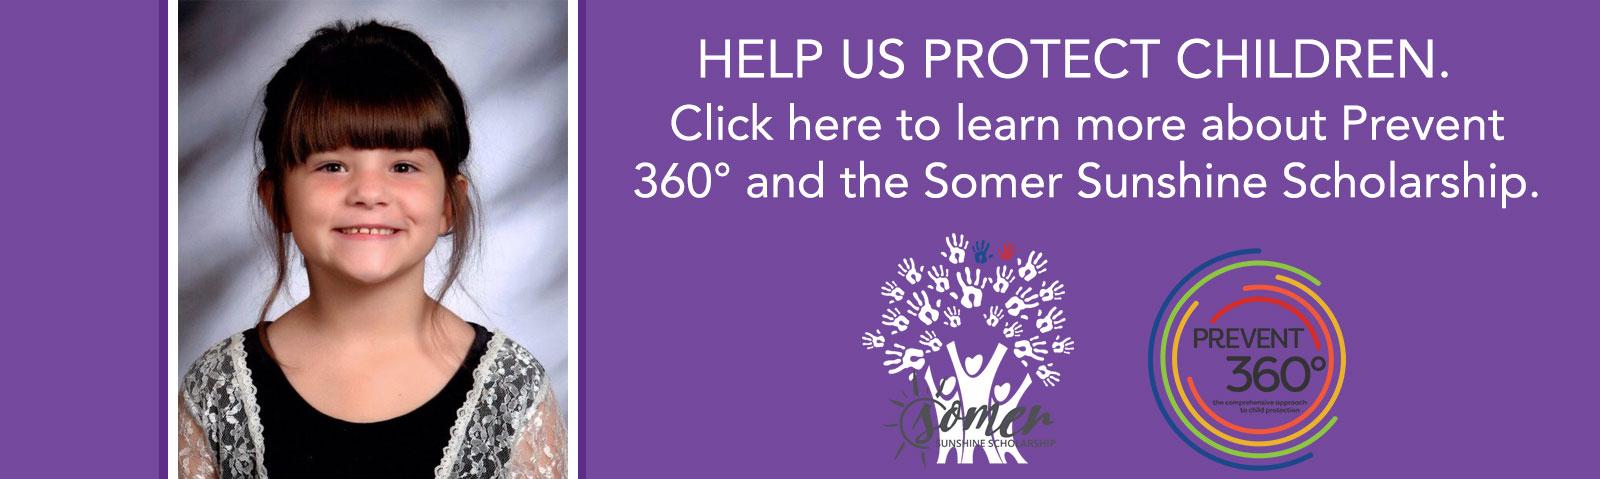 Prevention Program Safeguards Childrens >> Monique Burr Foundation